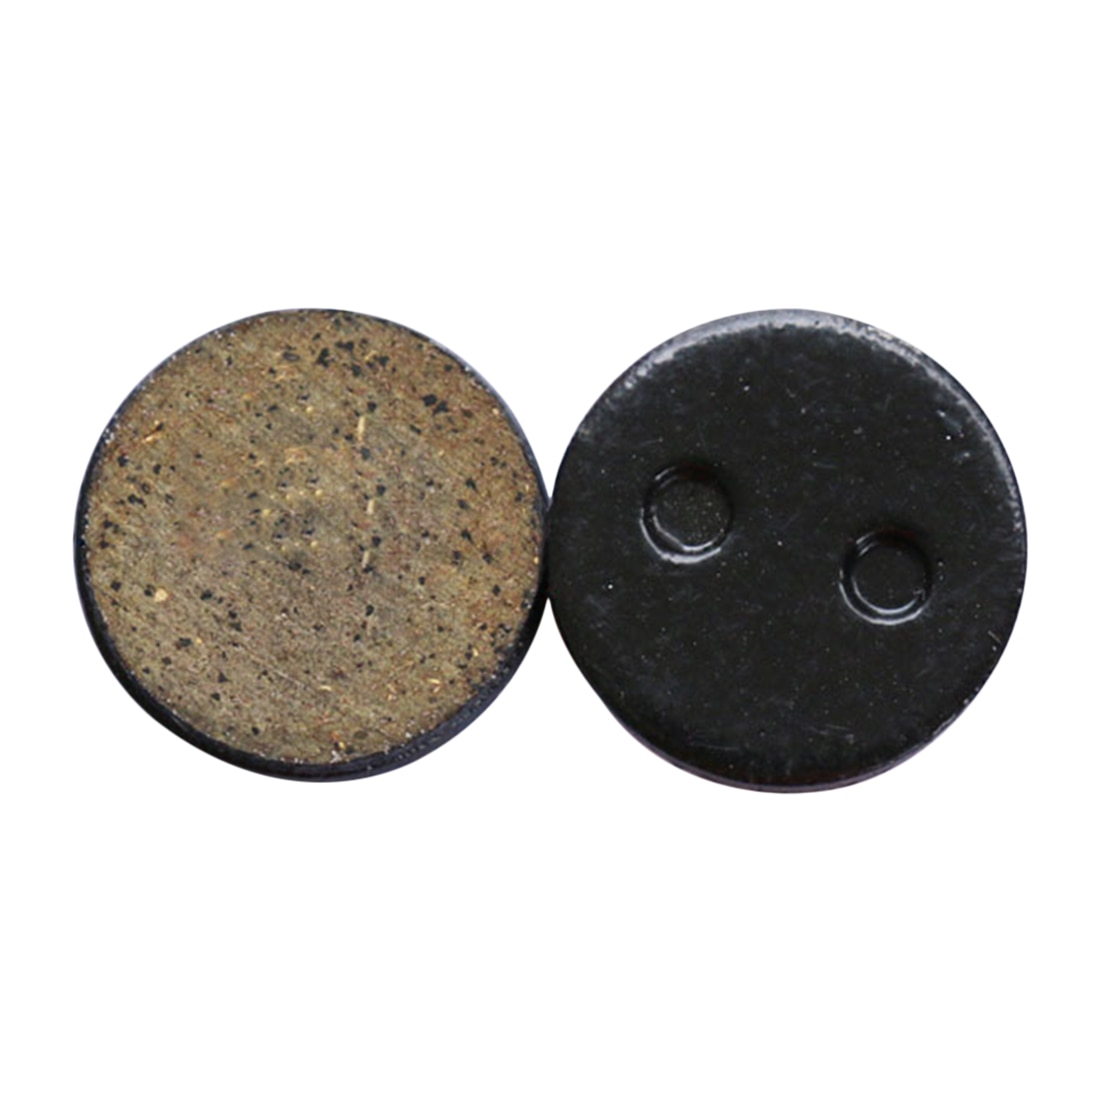 2 Pcs/Set MTB Brake Pads Kit for Xiaomi Mijia M365 Scooter Skateboard Caliper ANS-03 M365 Mountain B